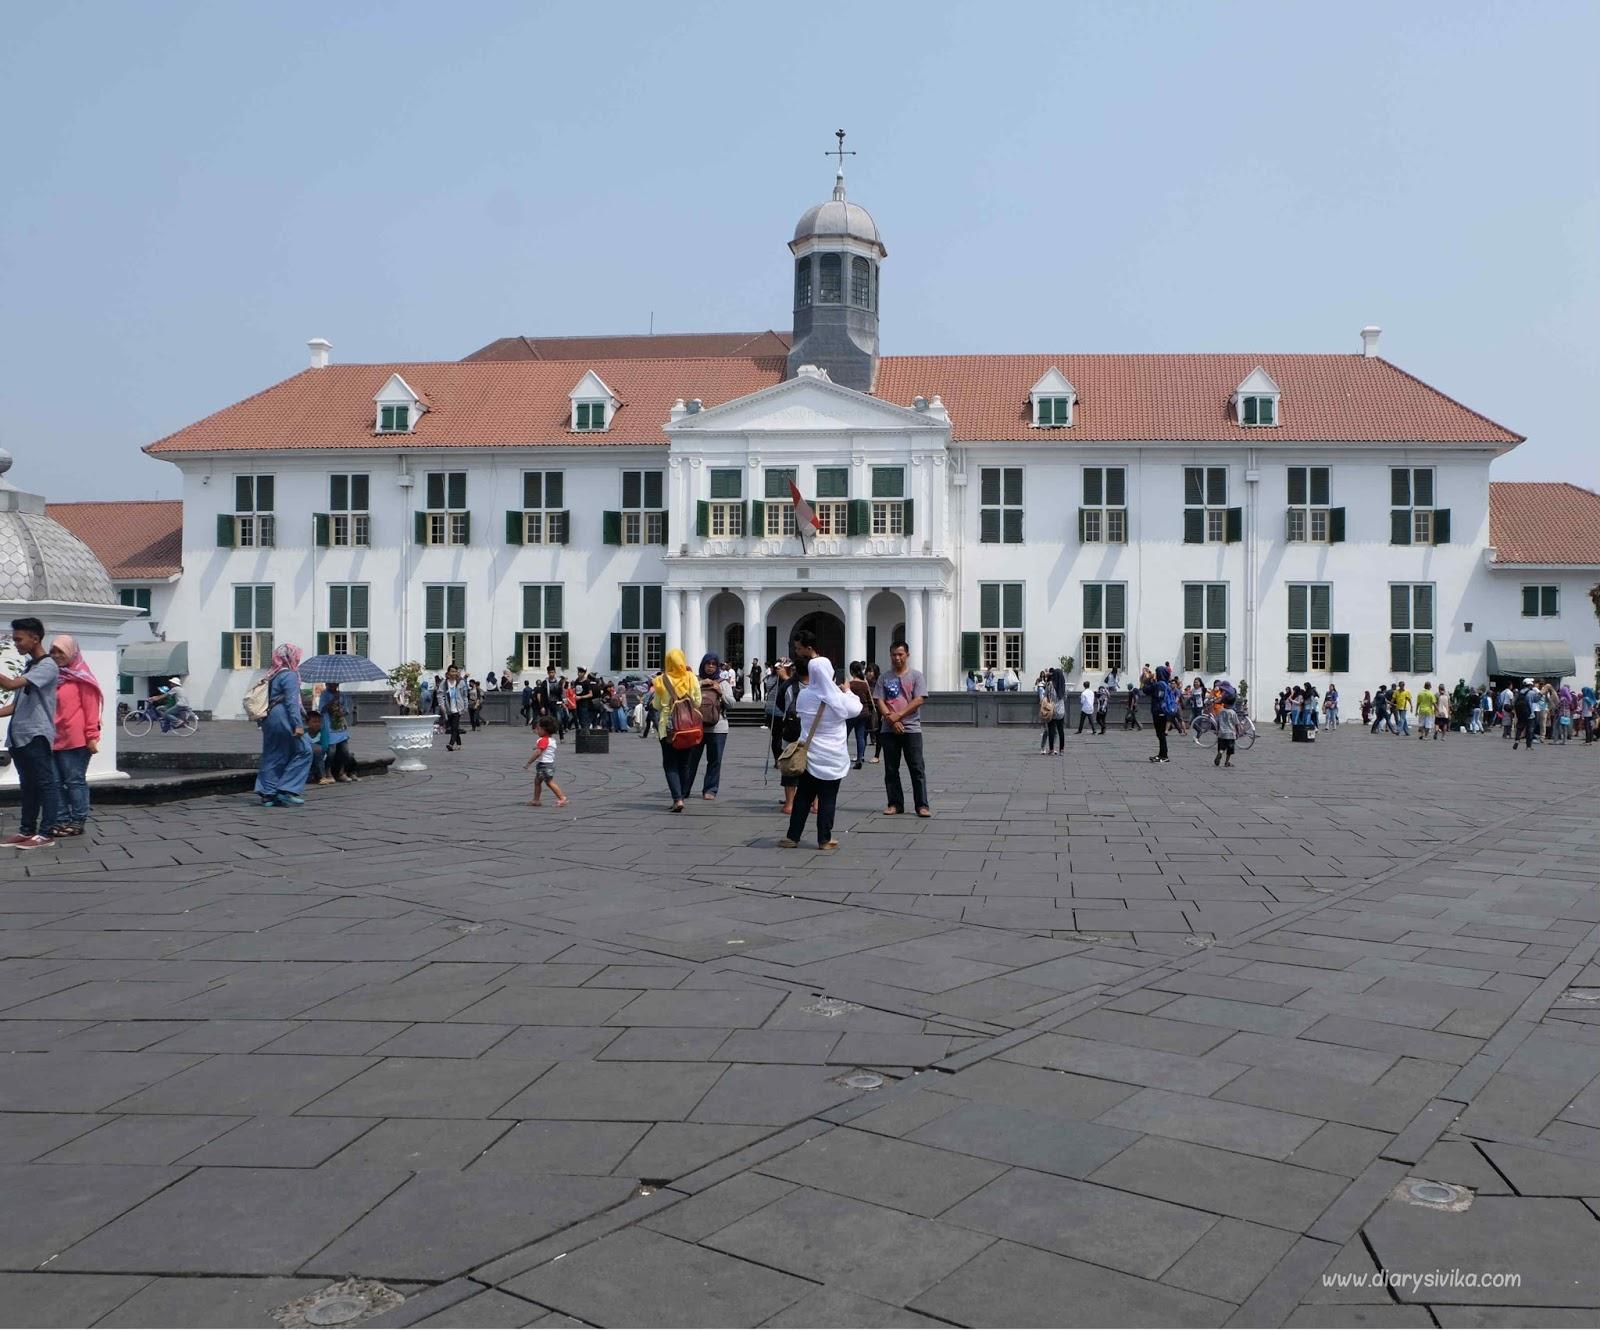 Wisata Kota Tua Jakarta - Food, Travel and Lifestyle Blog